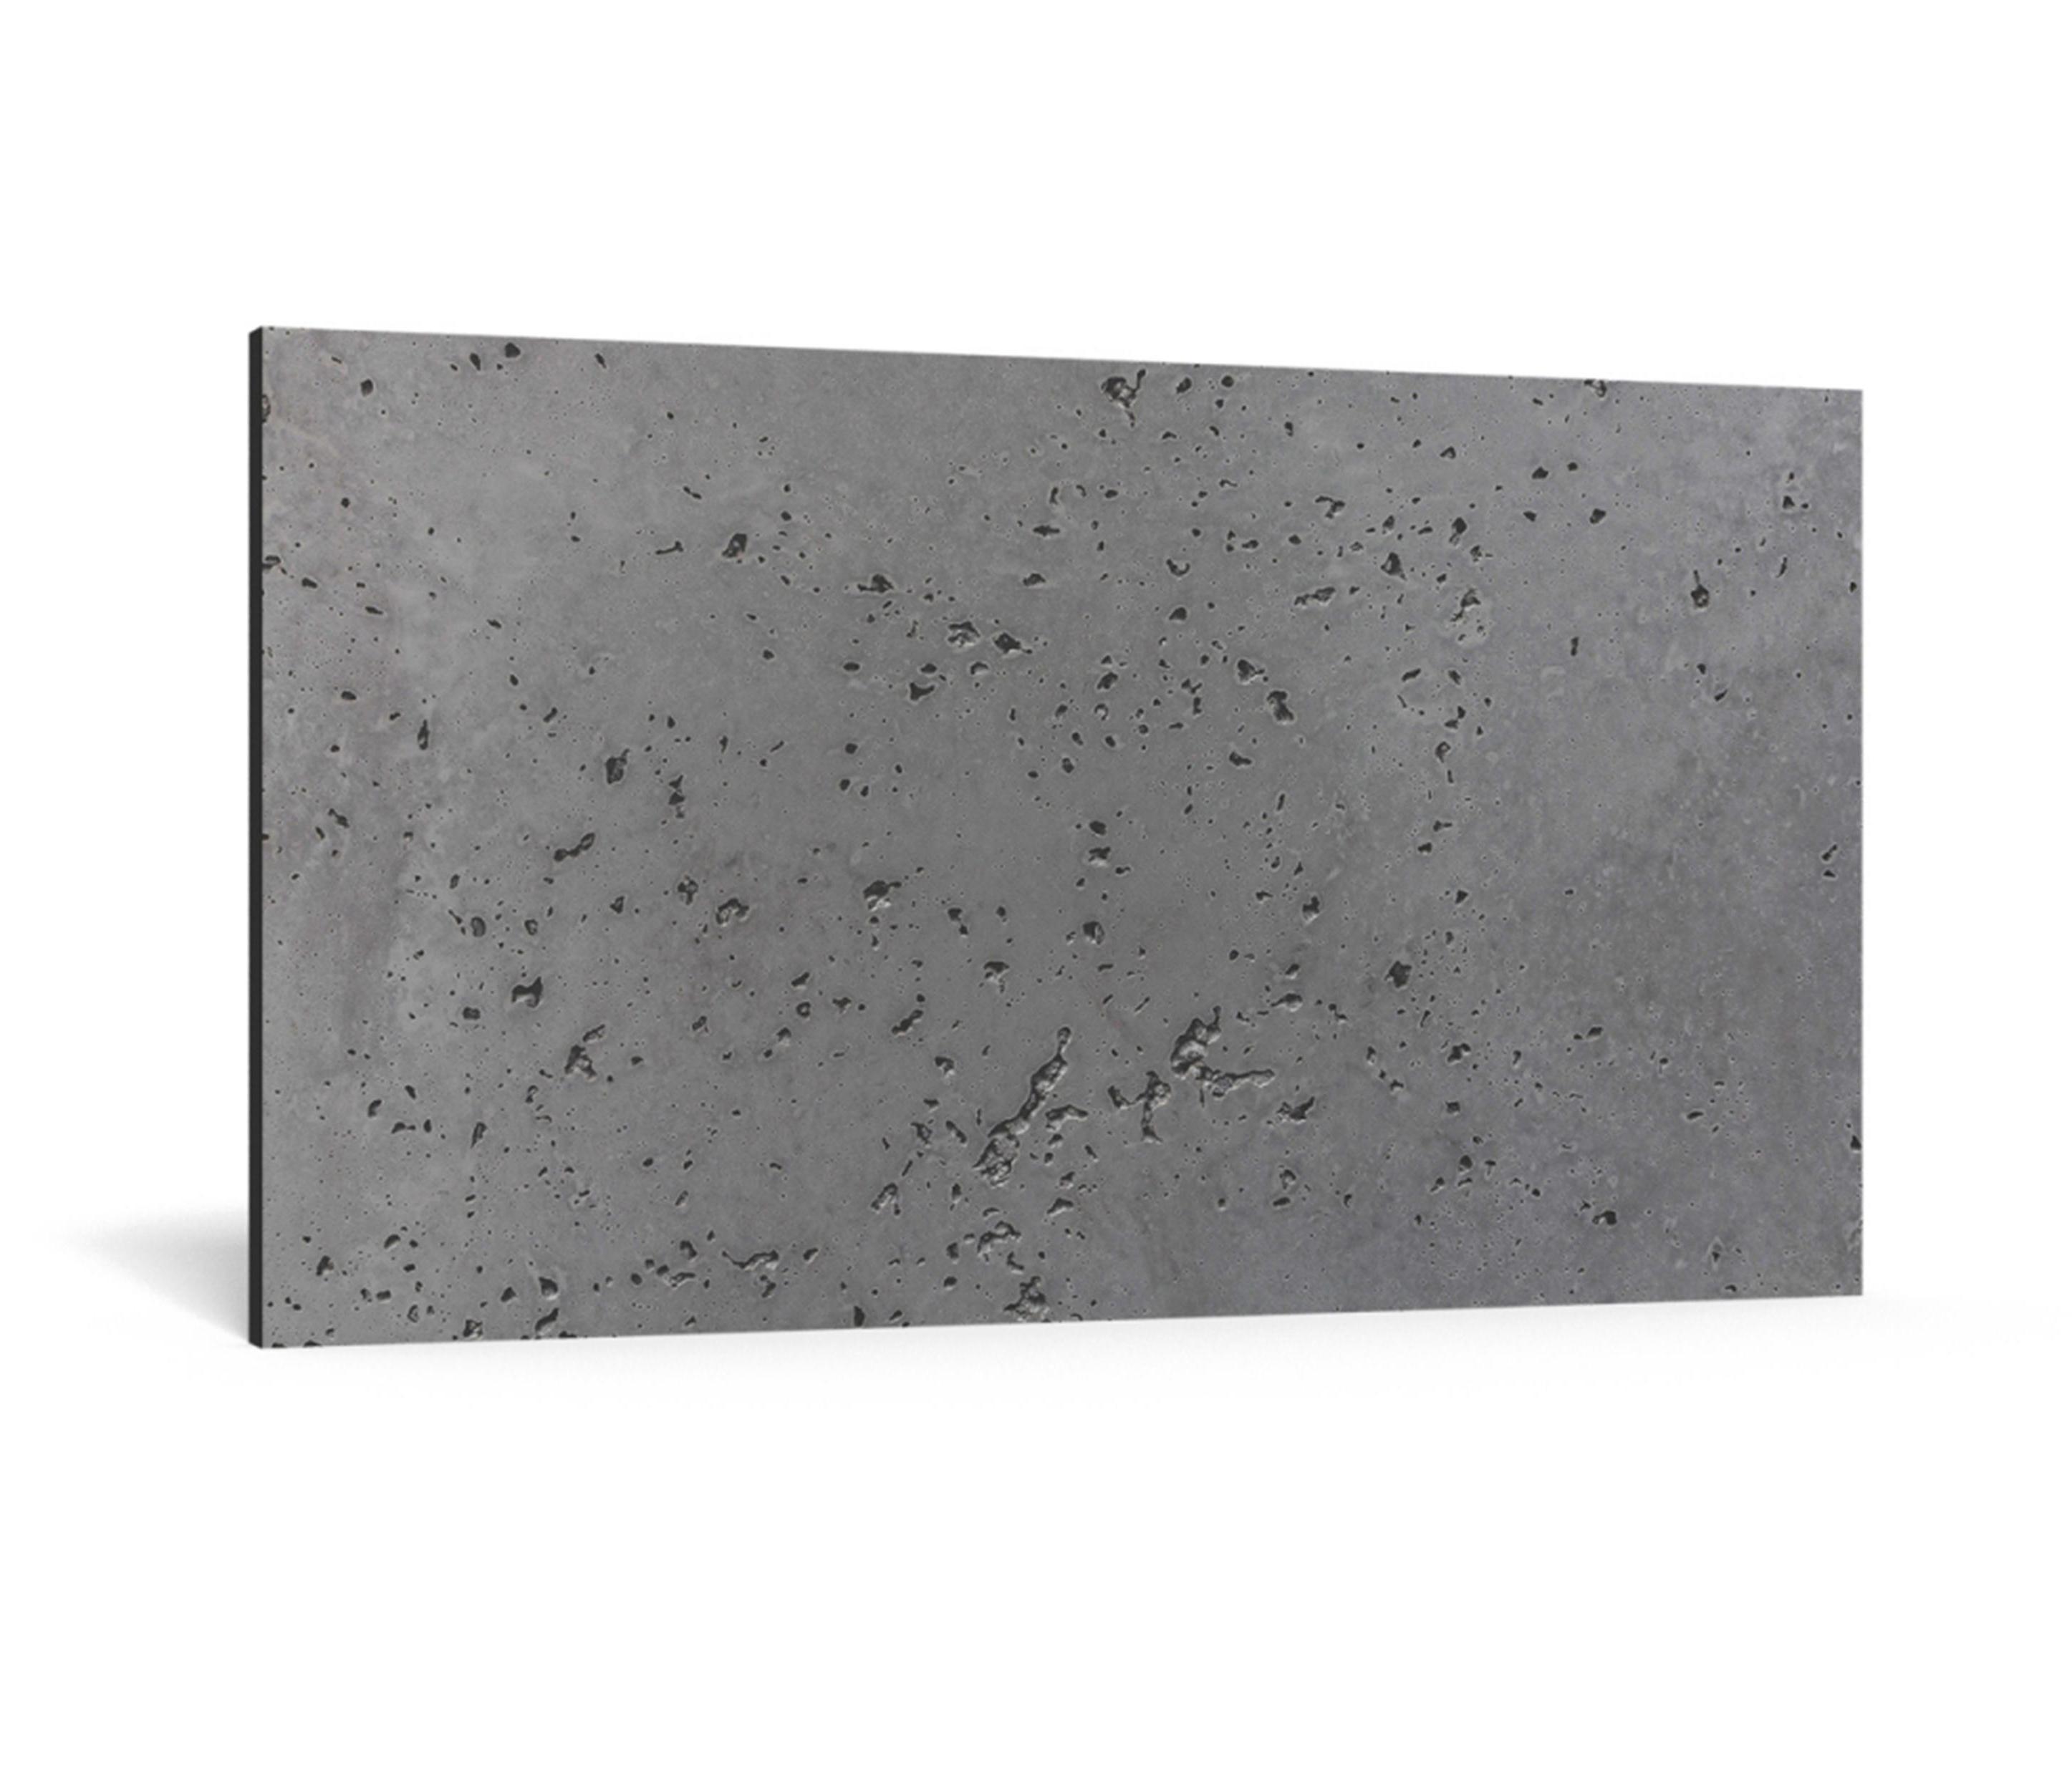 01-porous-panel-b